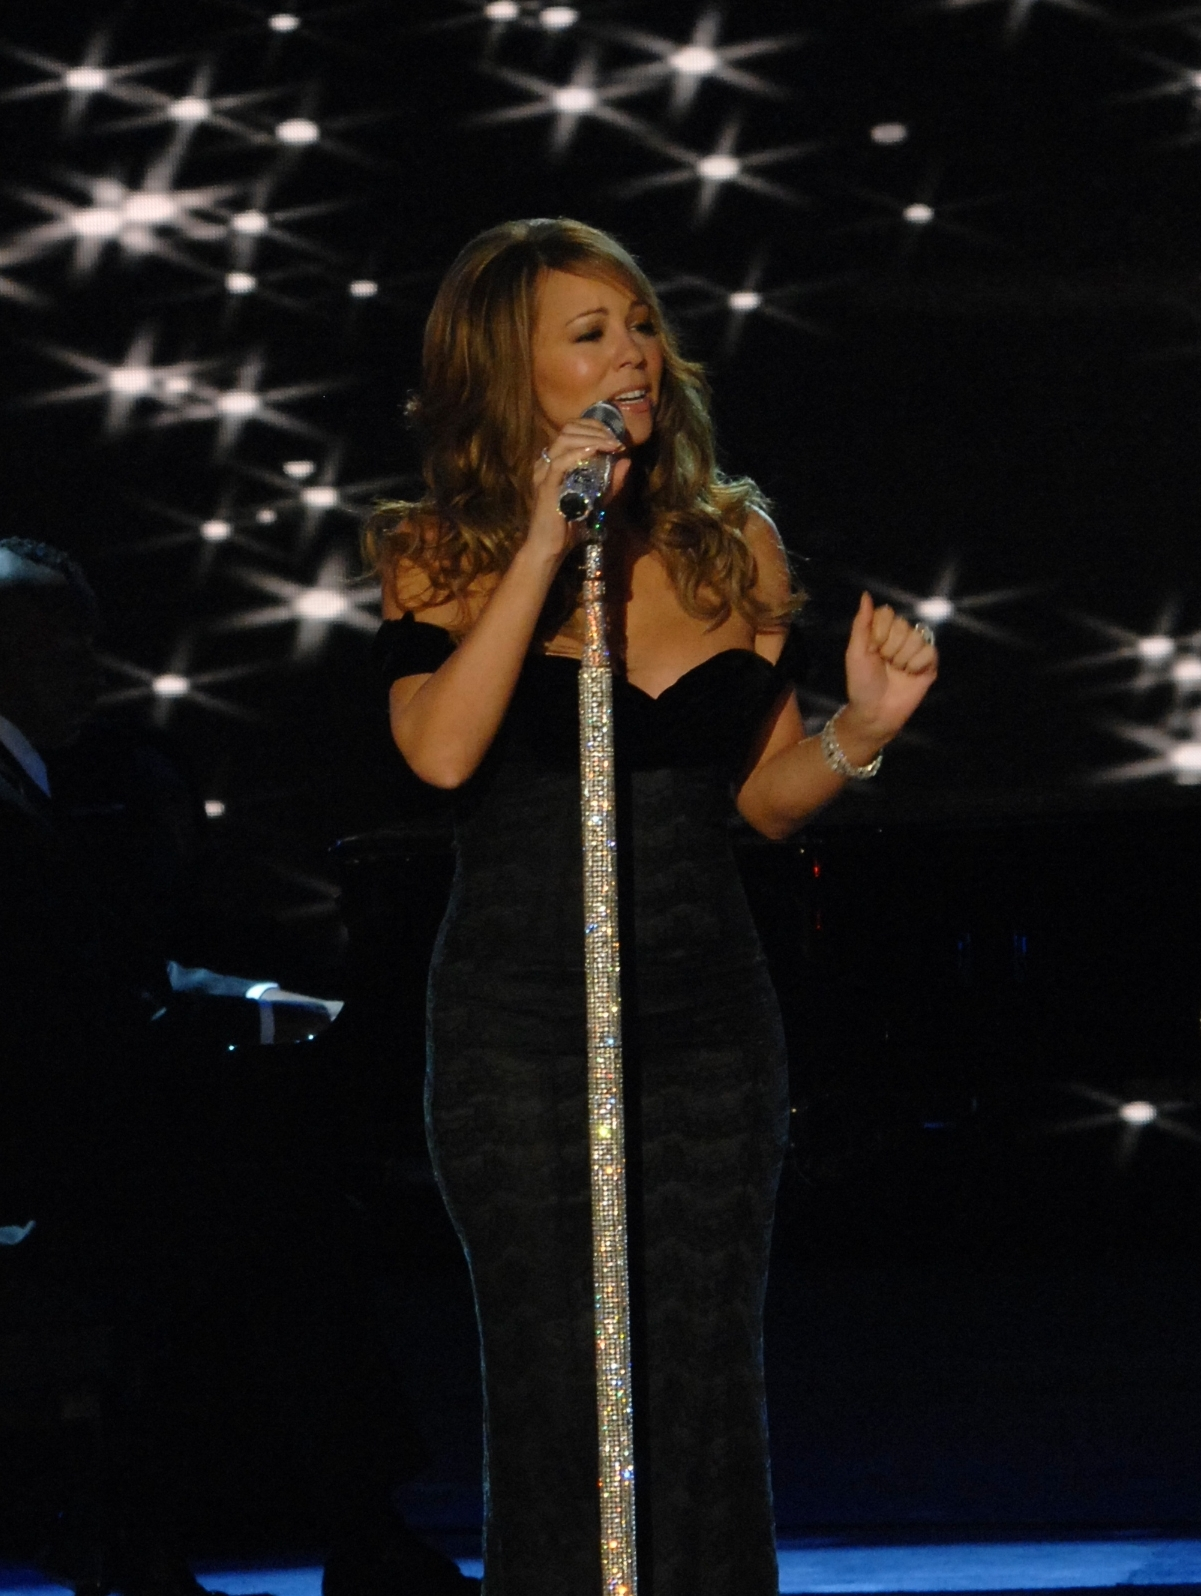 Mariah carey dating july 2017